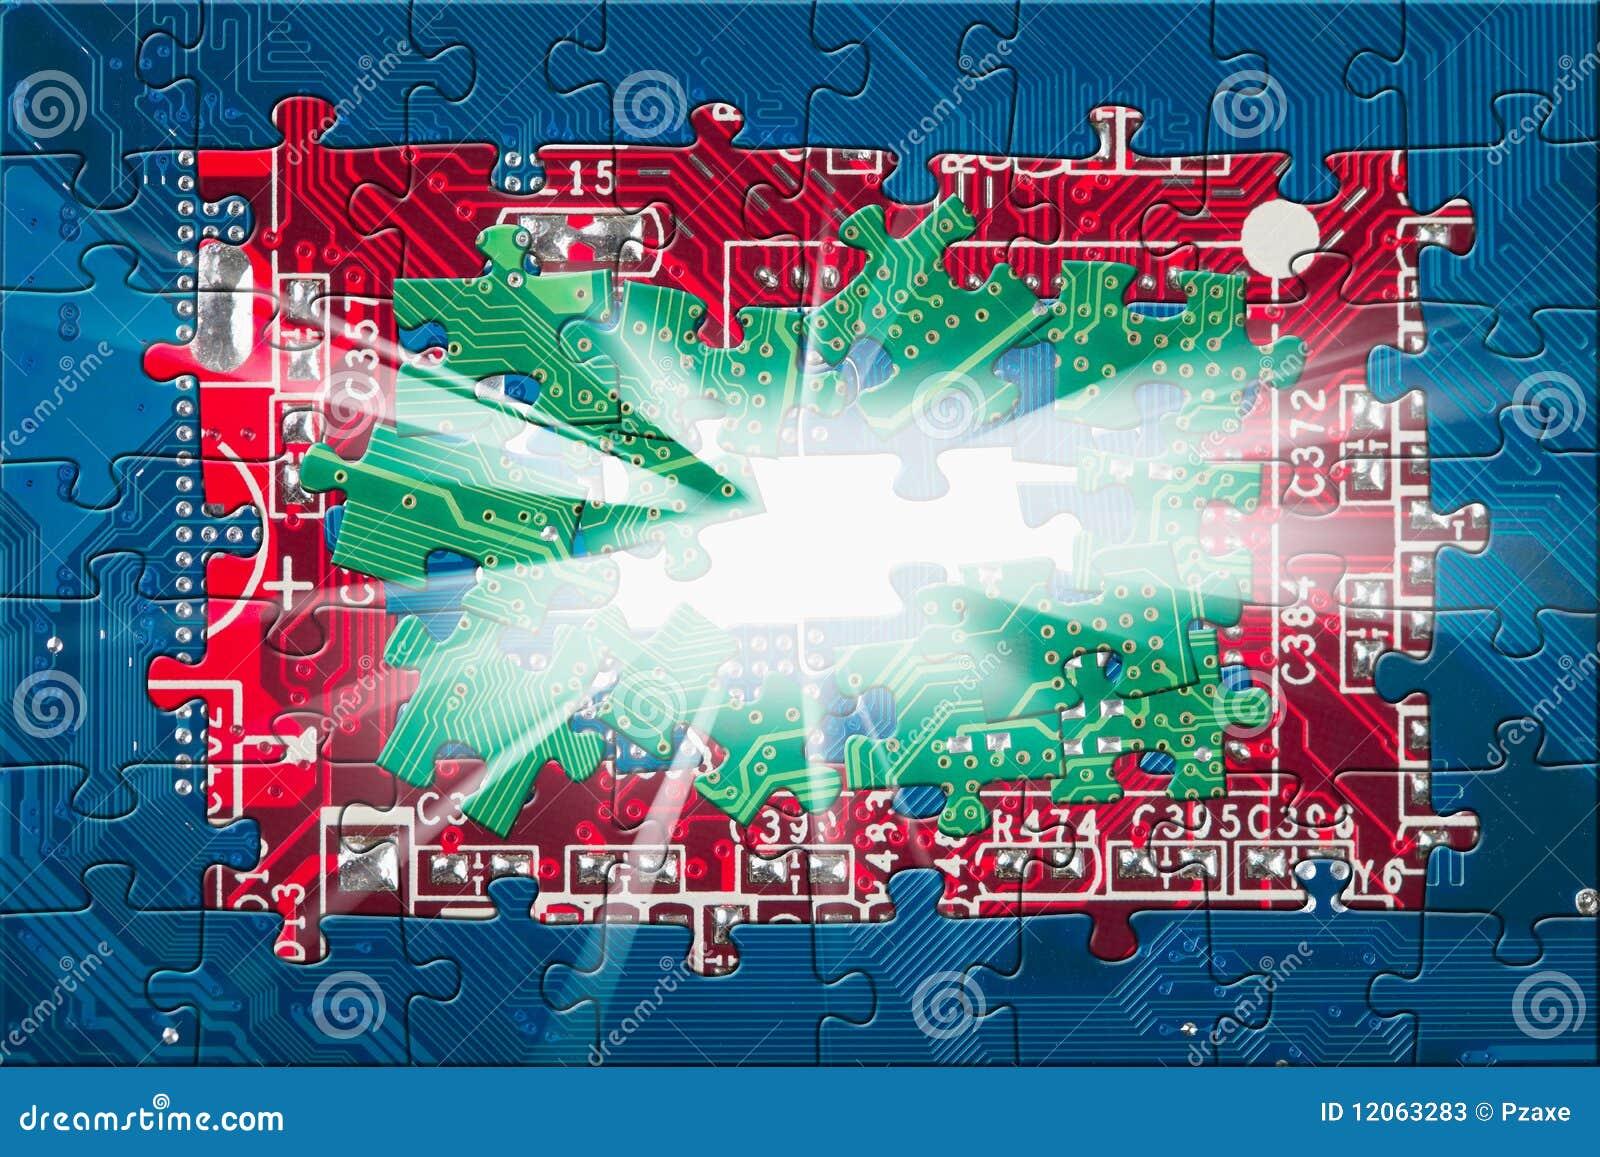 Circuit Board Light Blue Royalty Free Stock Photos Image 17537248